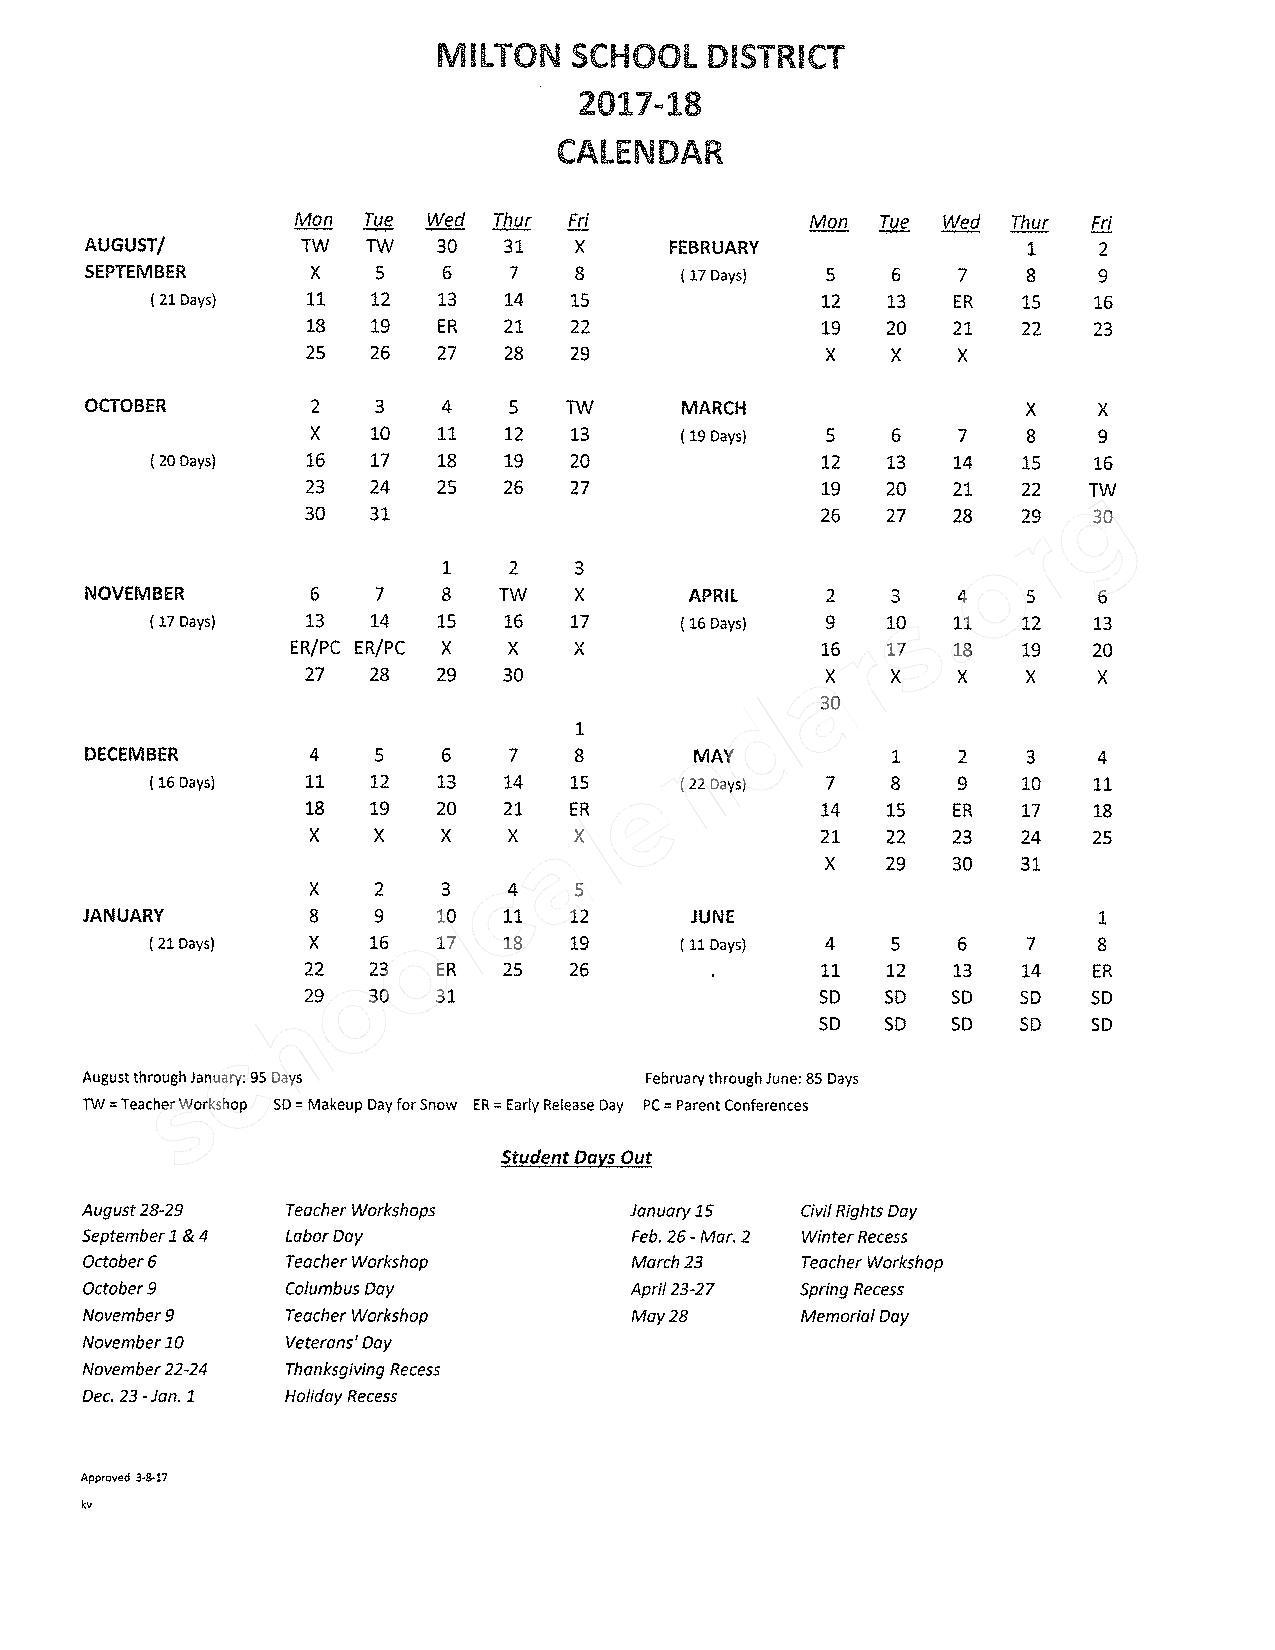 2017 - 2018 District Calendar – SAU 64 - Milton School District – page 1